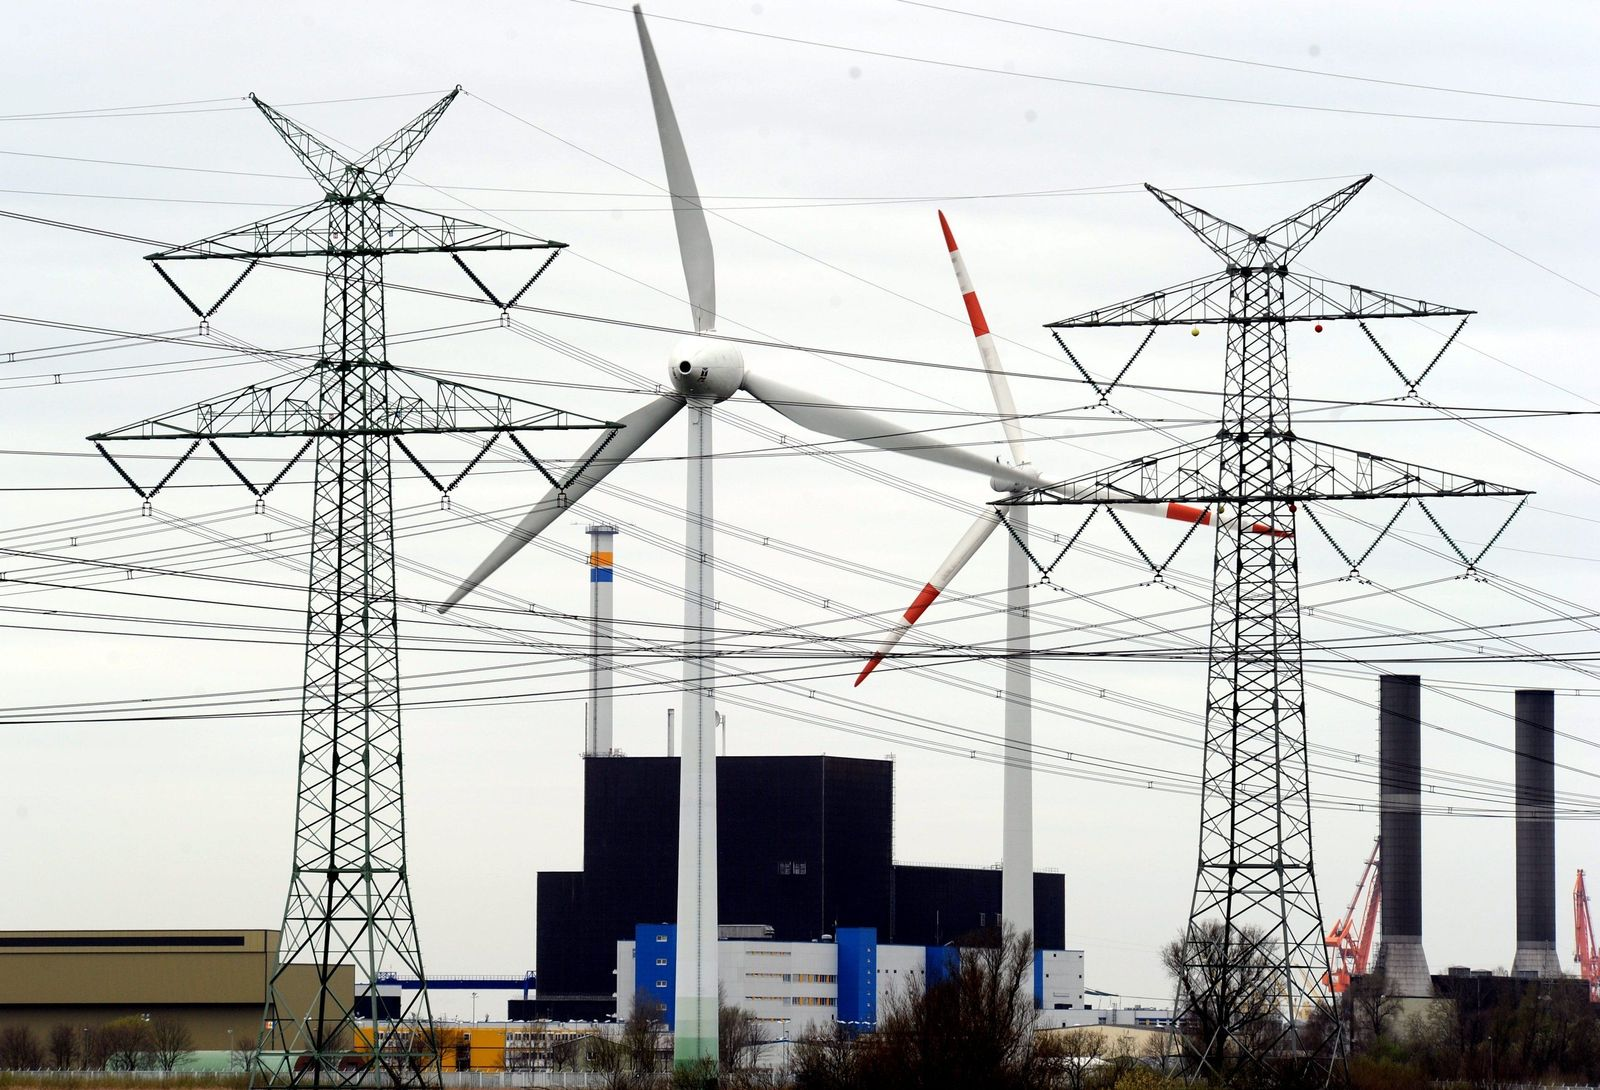 AKW Brokdorf/ Stromnetze/ Atomkraft